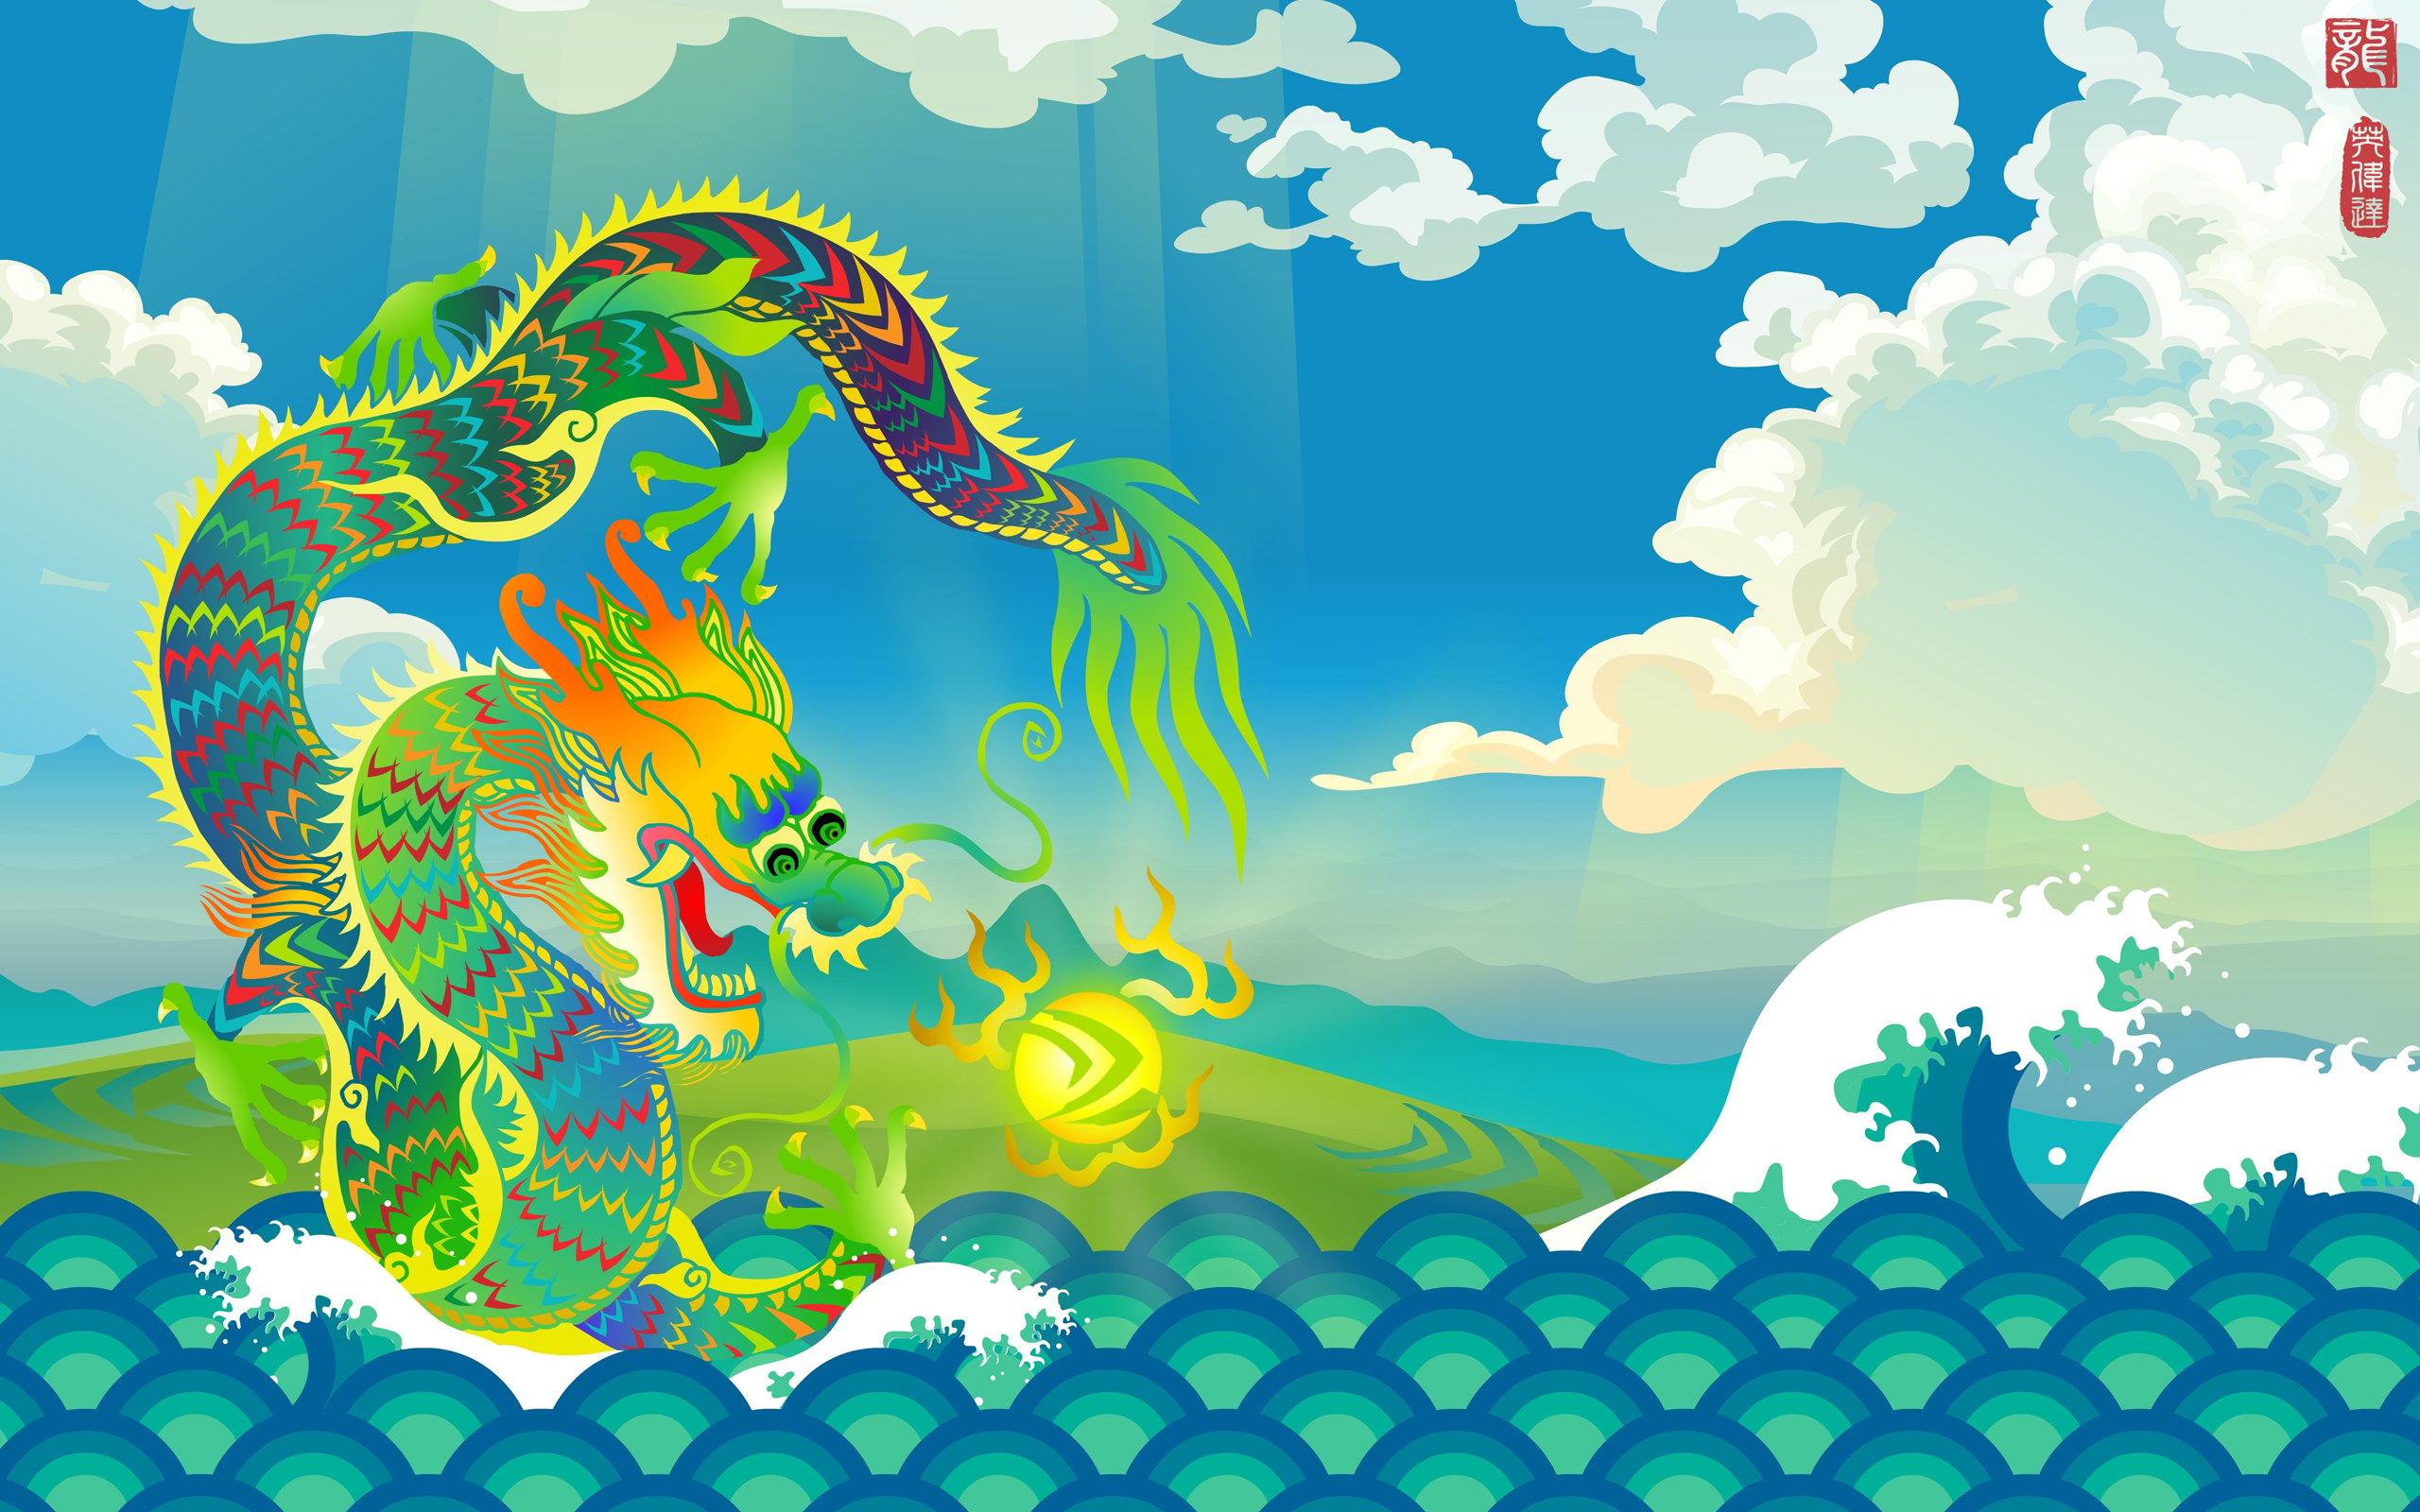 Dragon Wallpaper Download Demos Wallpapers and Screensavers 2560x1600